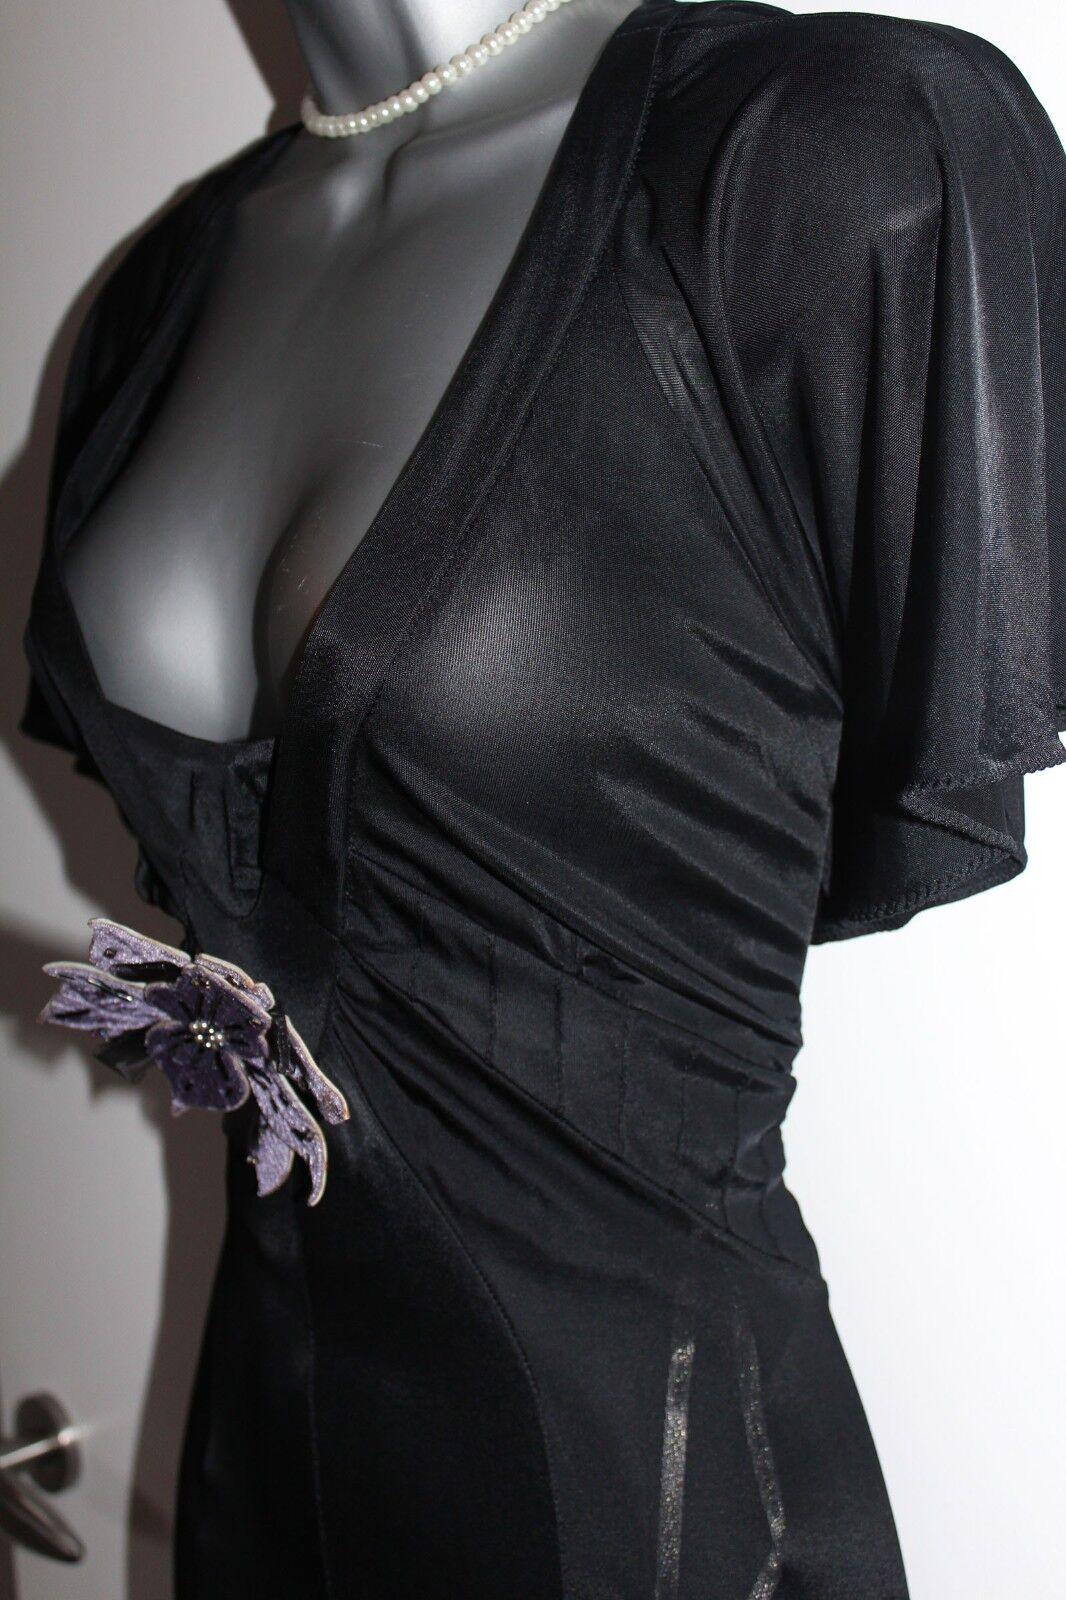 Karen Millen schwarz Butterfly Sleeve Floaty Evening Midi Dress sz-12 sz-12 sz-12 EU-40 0db1bd